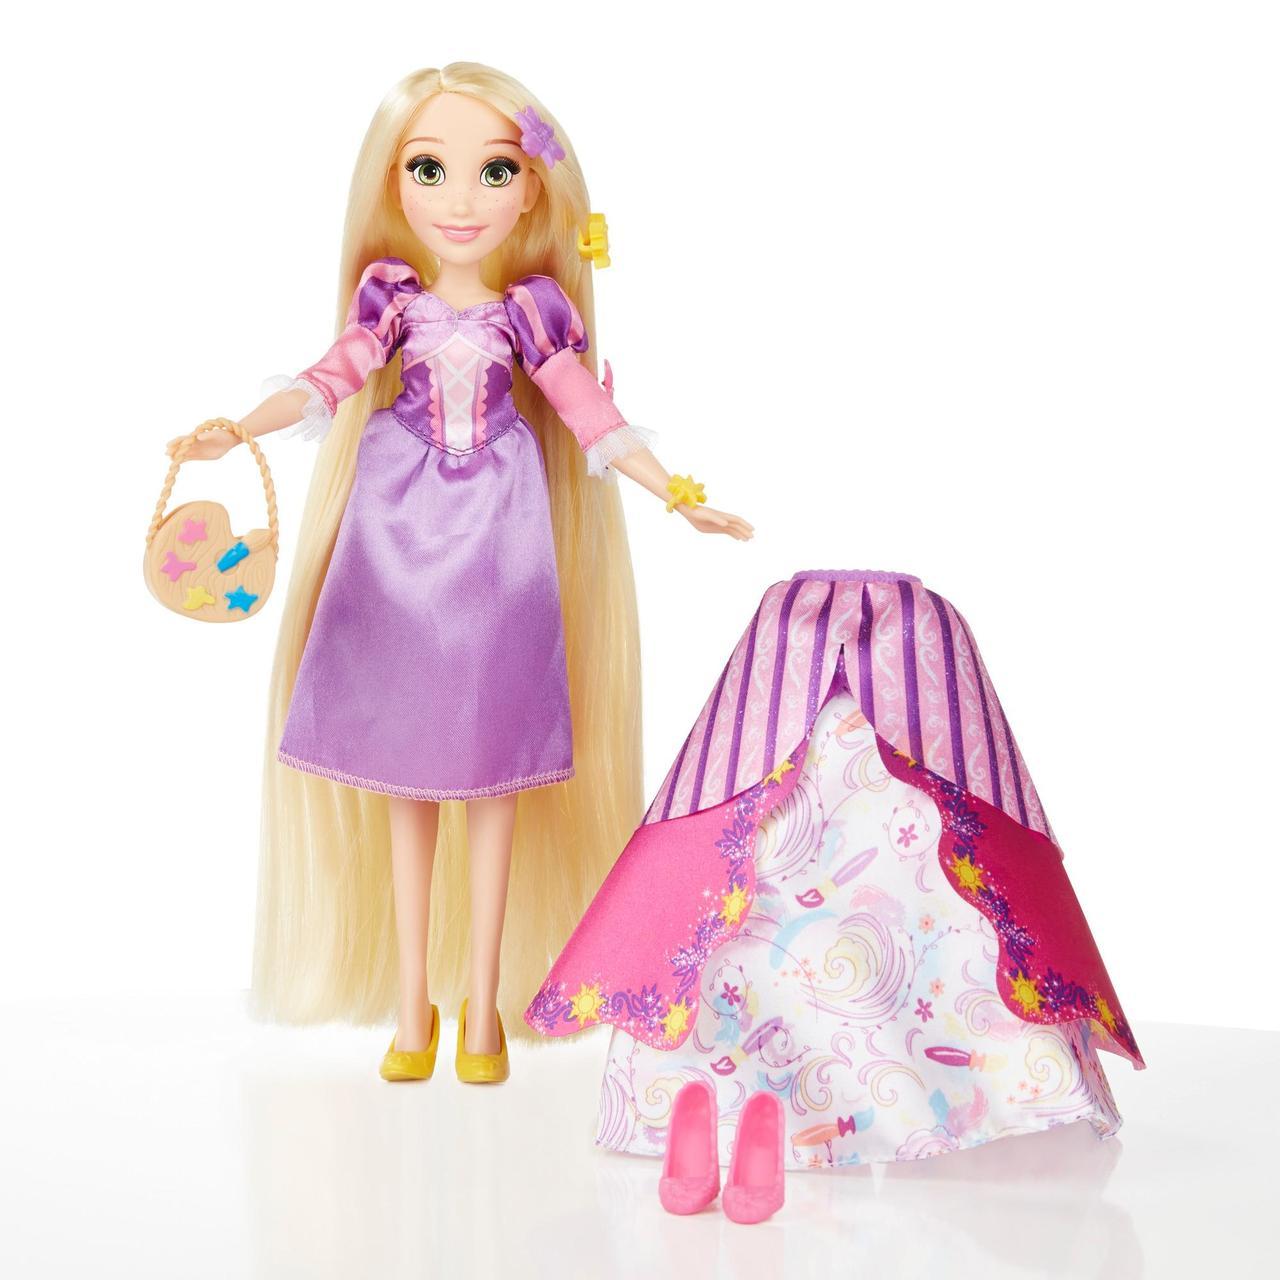 Disney Princess Рапунцель зі змінними сукнями (Кукла Дисней Рапунцель с красивыми нарядами, Rapunzel)